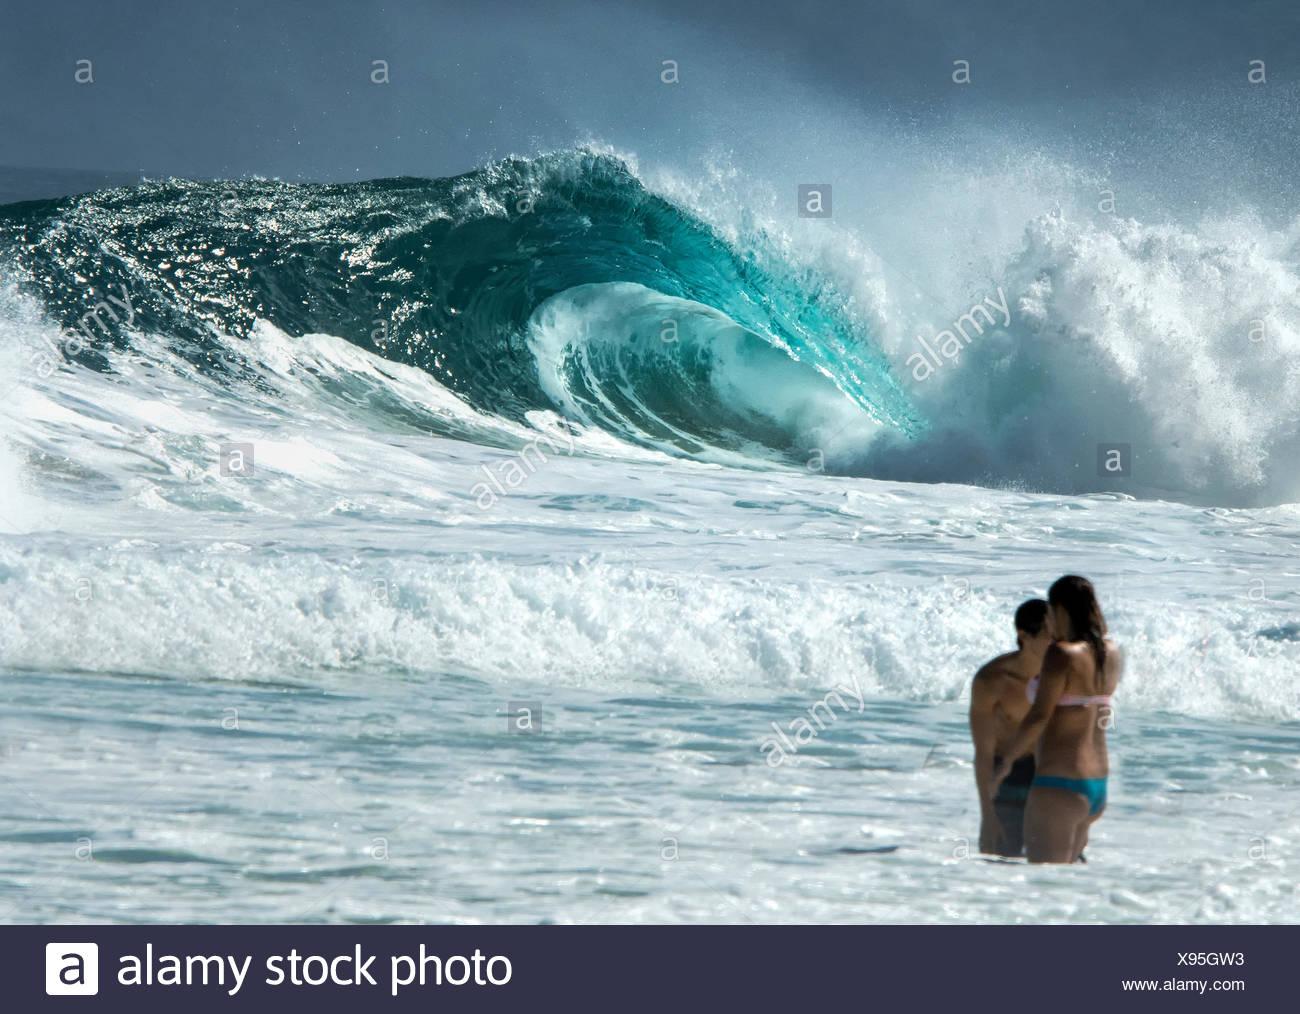 People standing in ocean and huge ocean wave in background - Stock Image